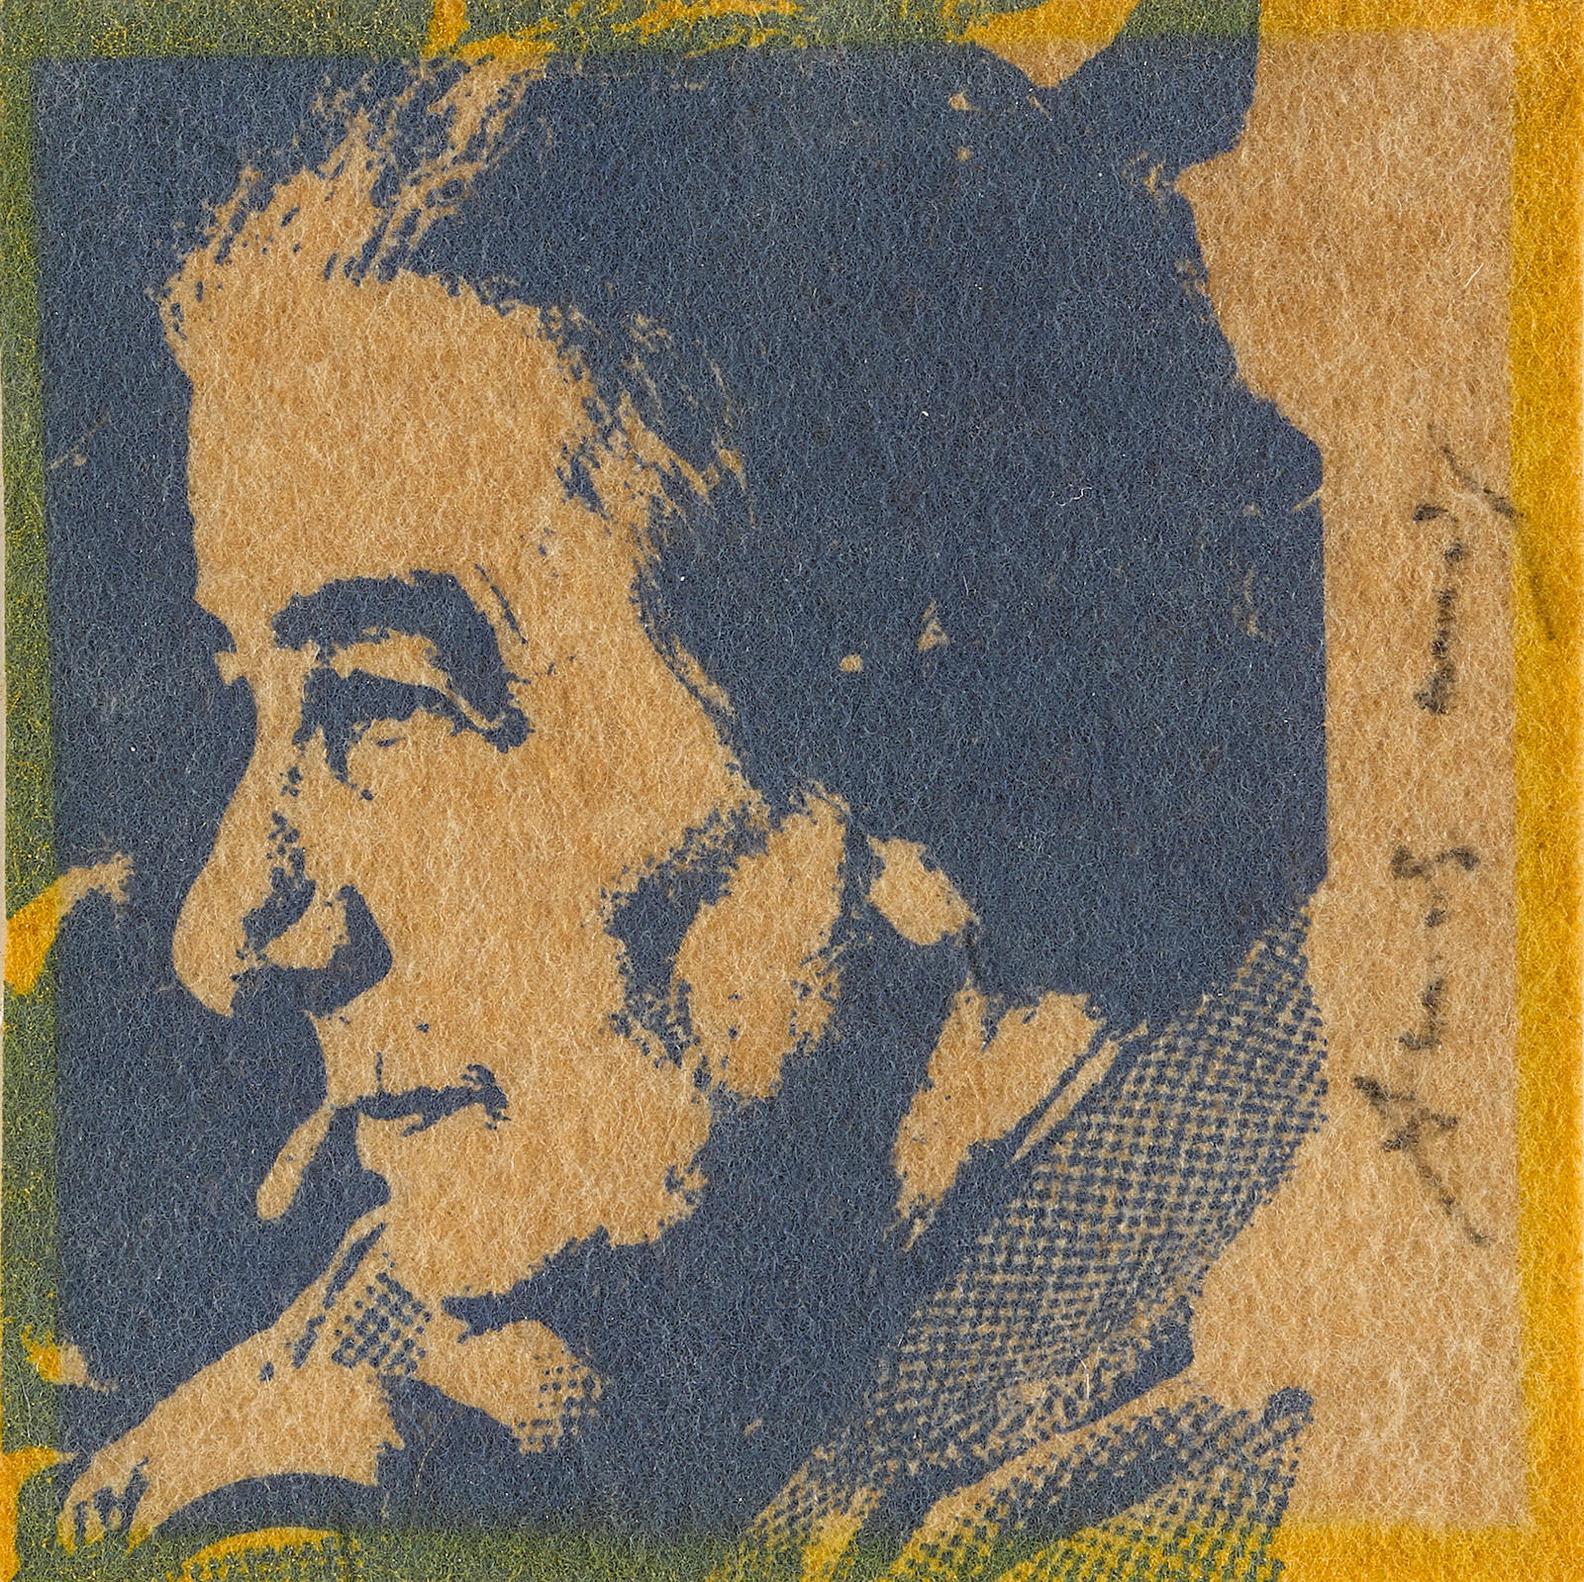 Andy Warhol-Golda Meier (F./S. II 153A)-1973